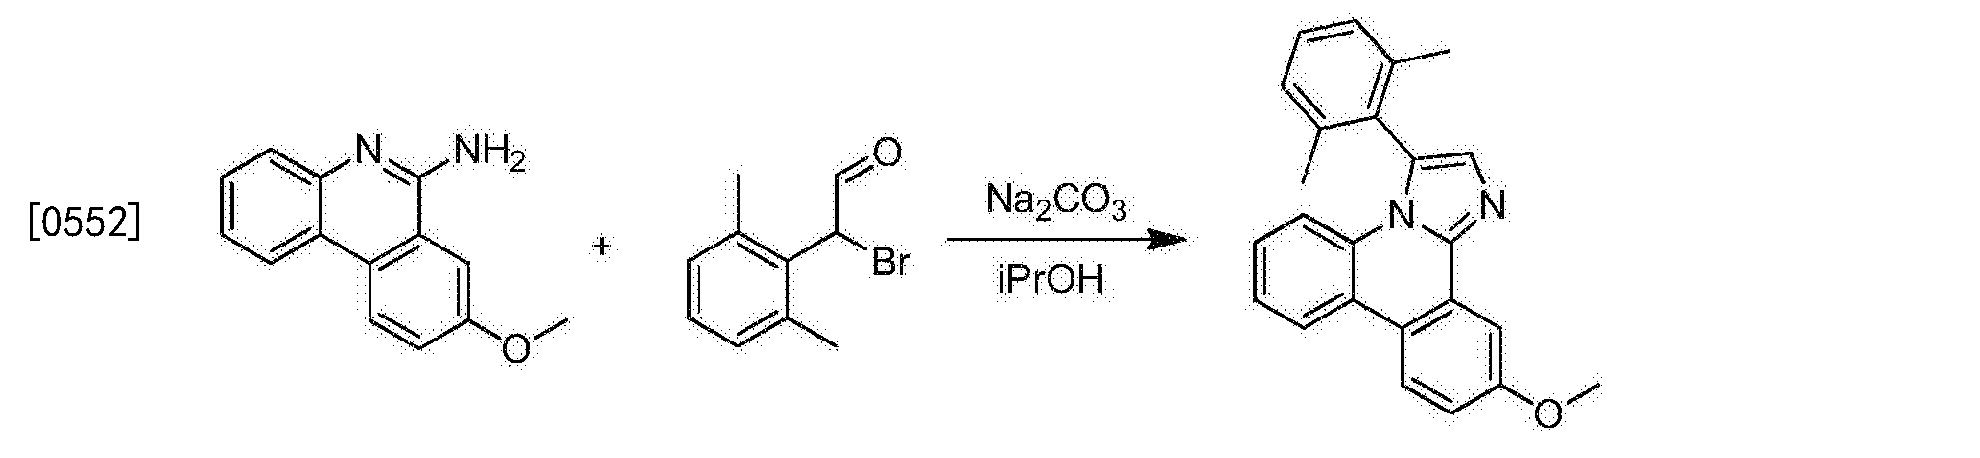 Figure CN106749425AD01594